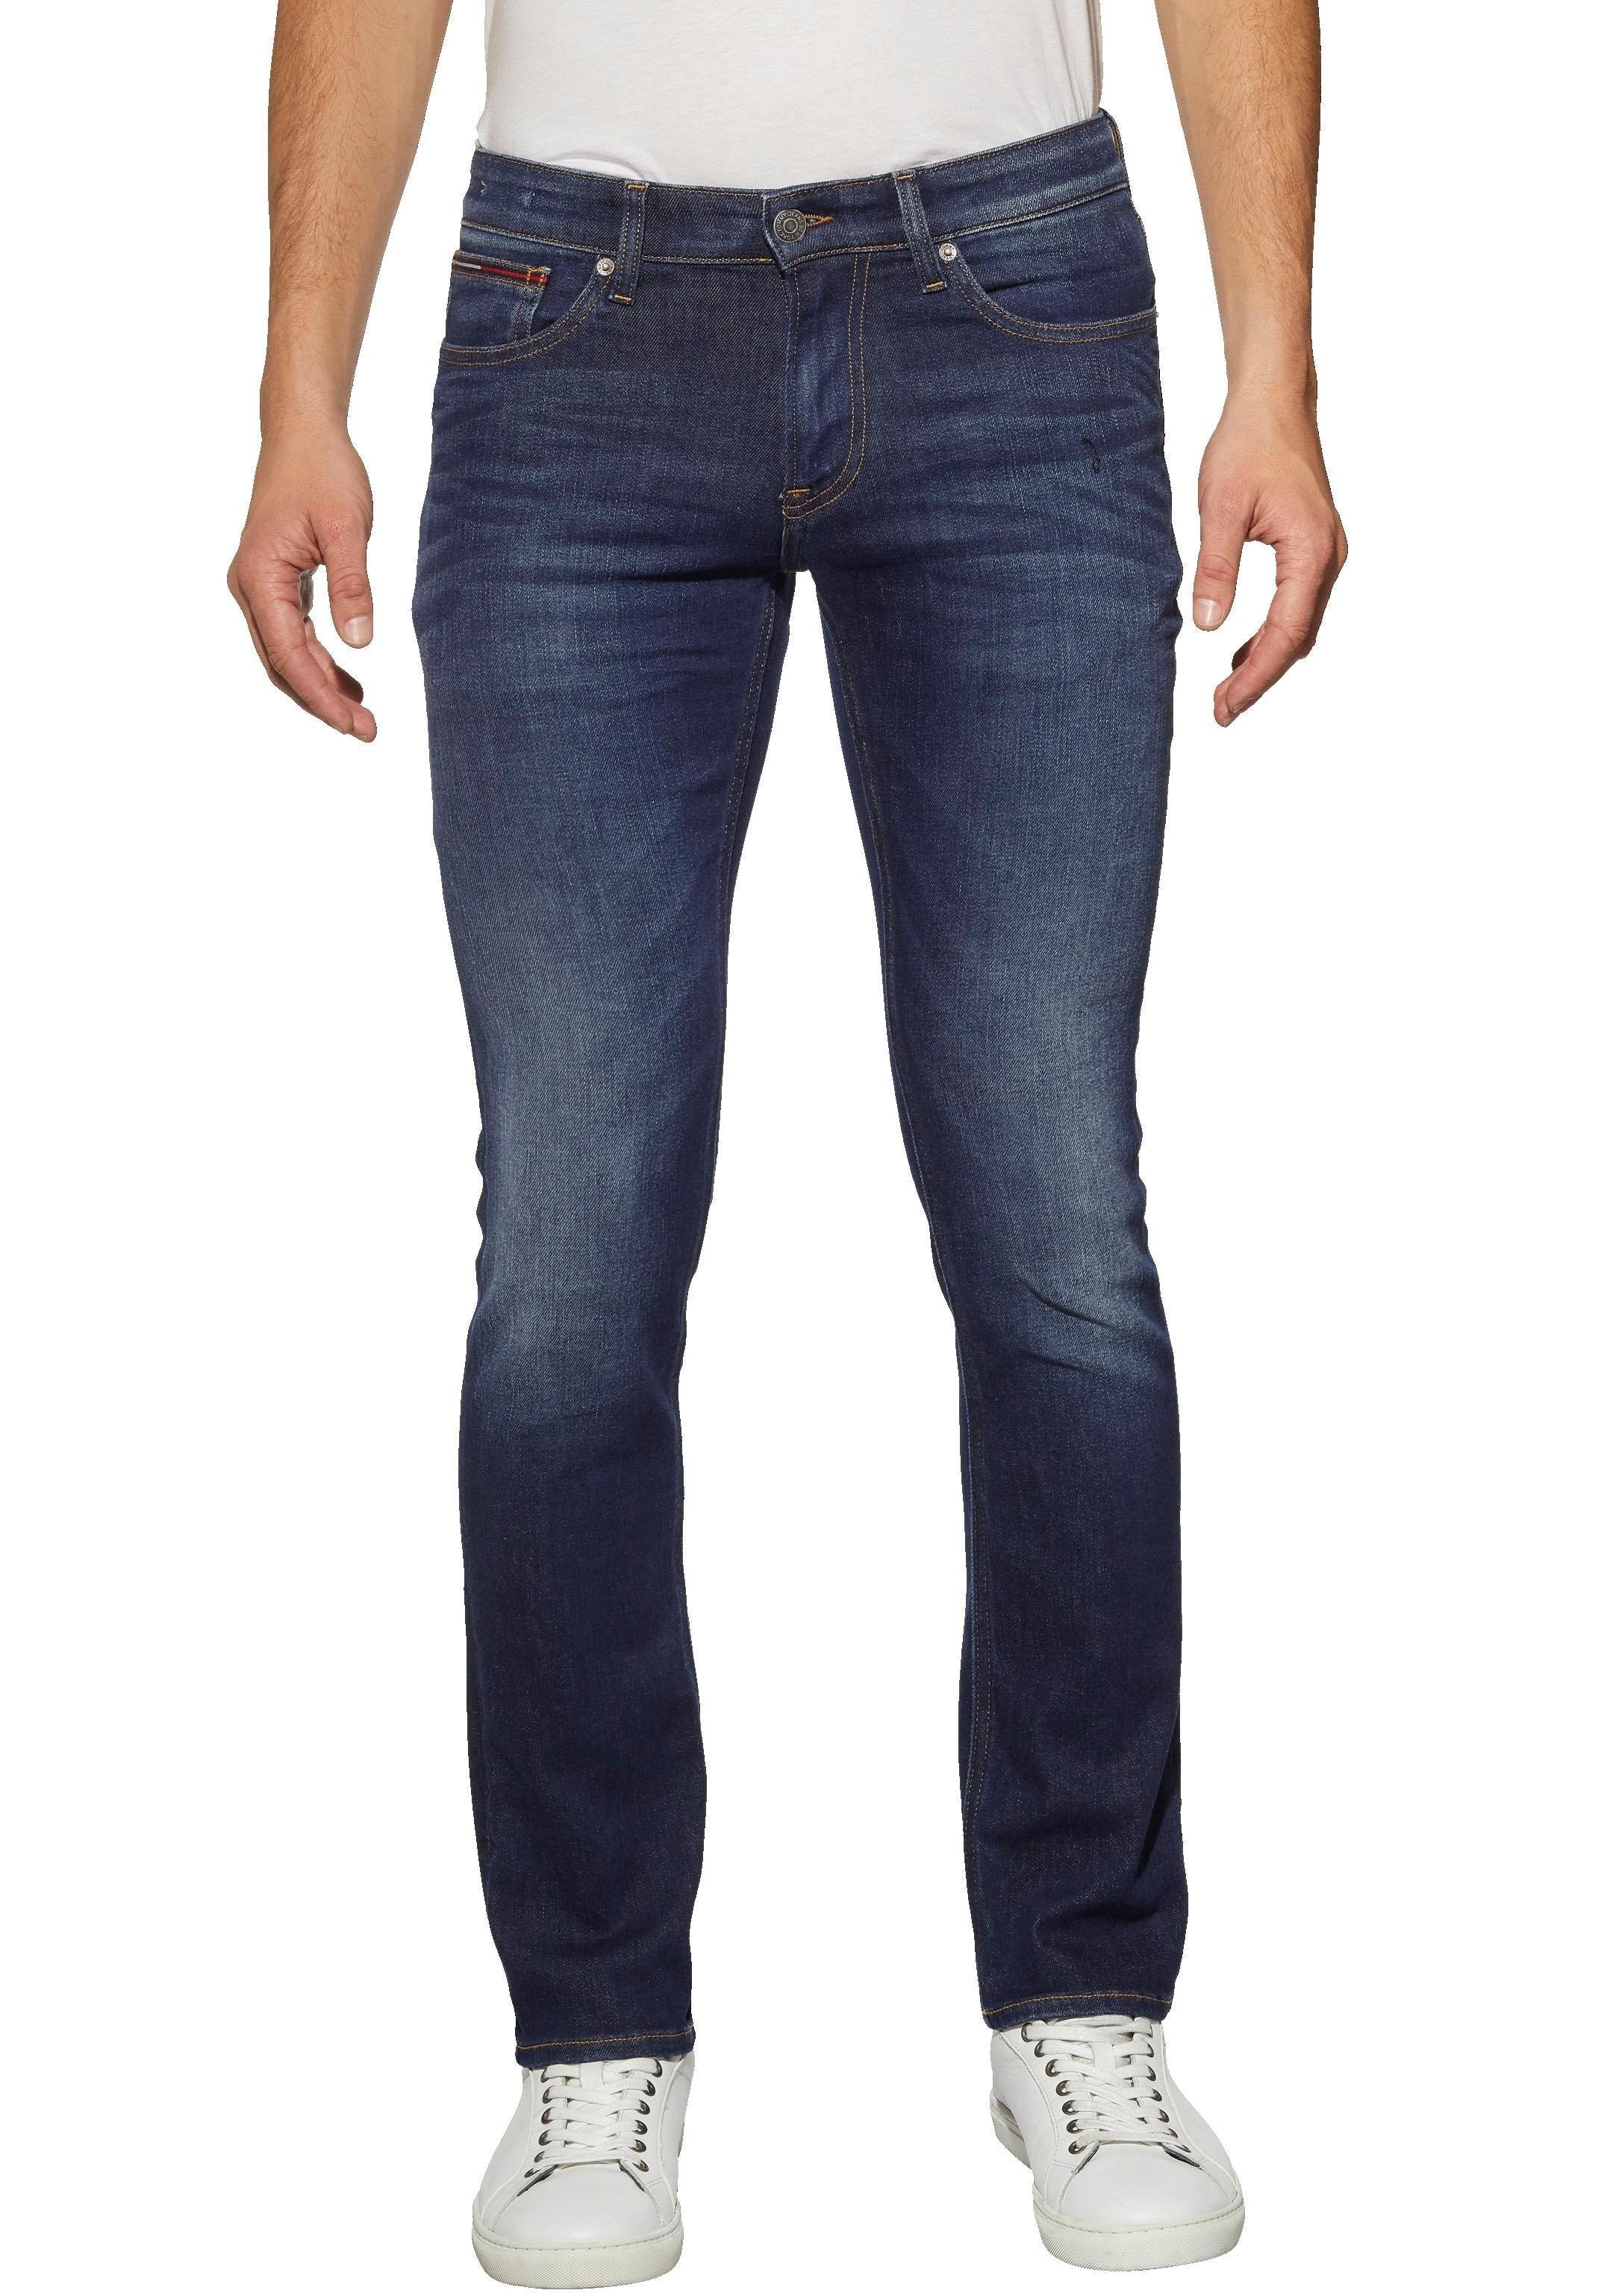 TOMMY JEANS slim fit jeans »SLIM SCANTON« bestellen: 30 dagen bedenktijd